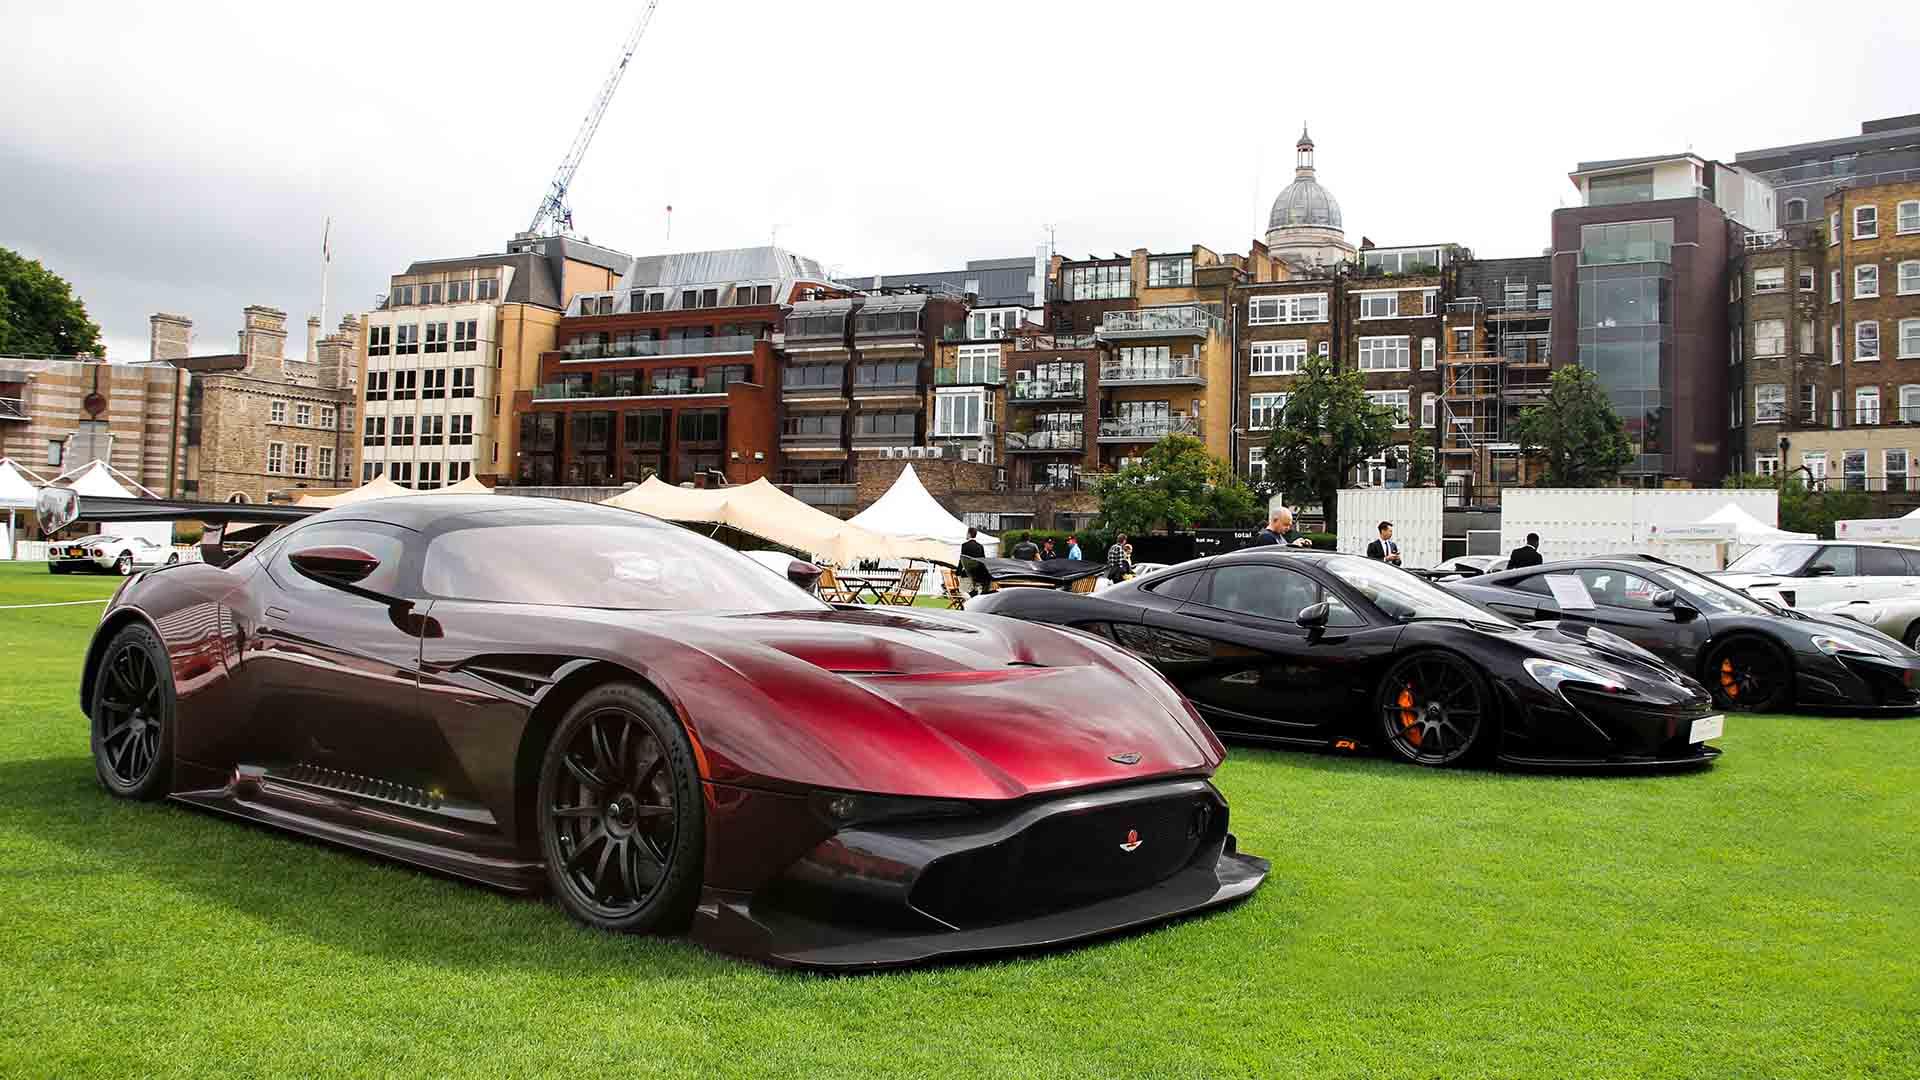 Aston Martin Vulcan and McLaren P1